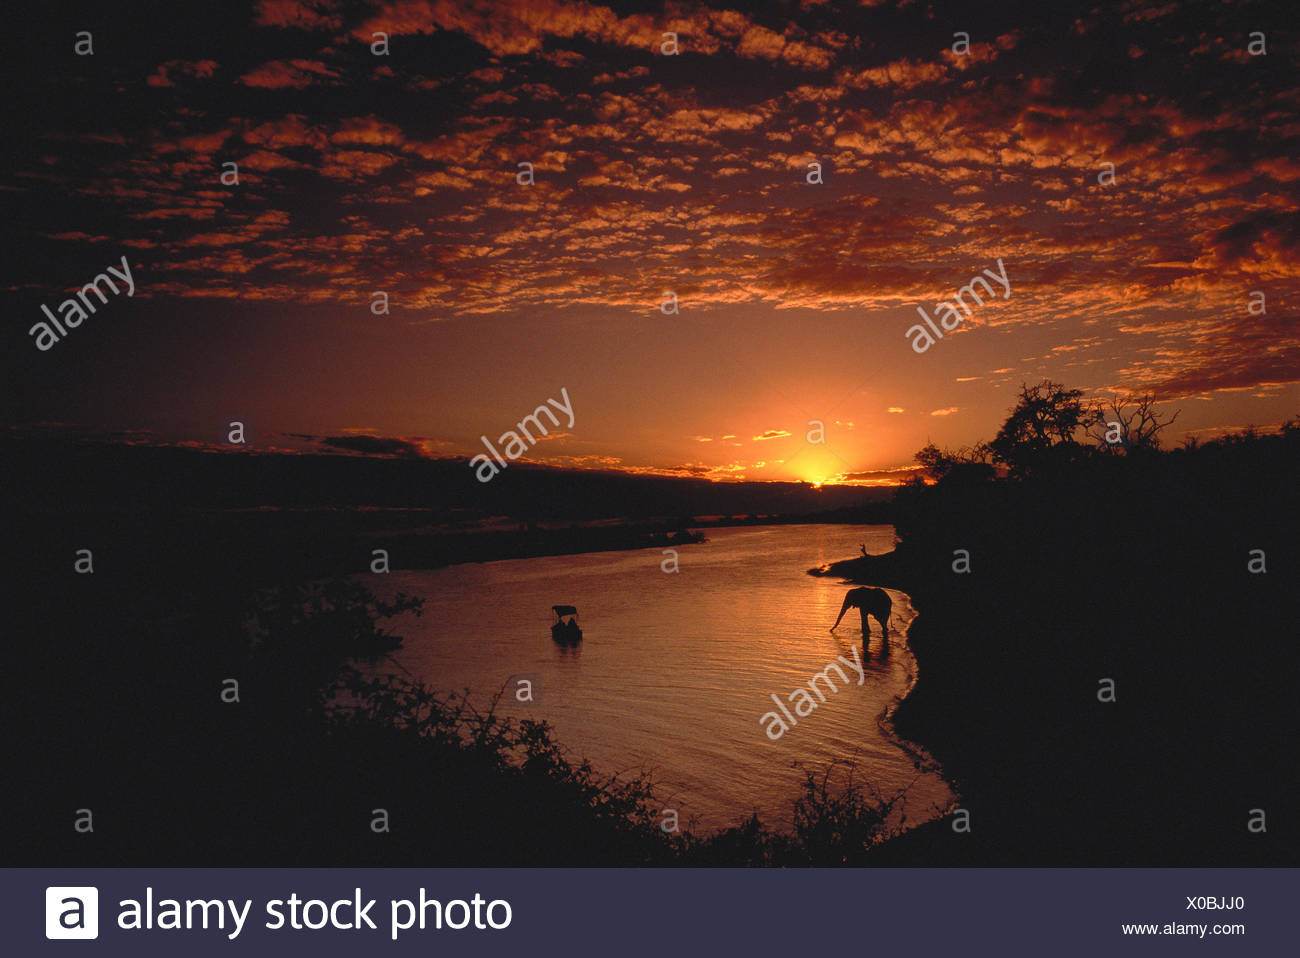 Sunset over Chobe River Botswana, Africa - Stock Image